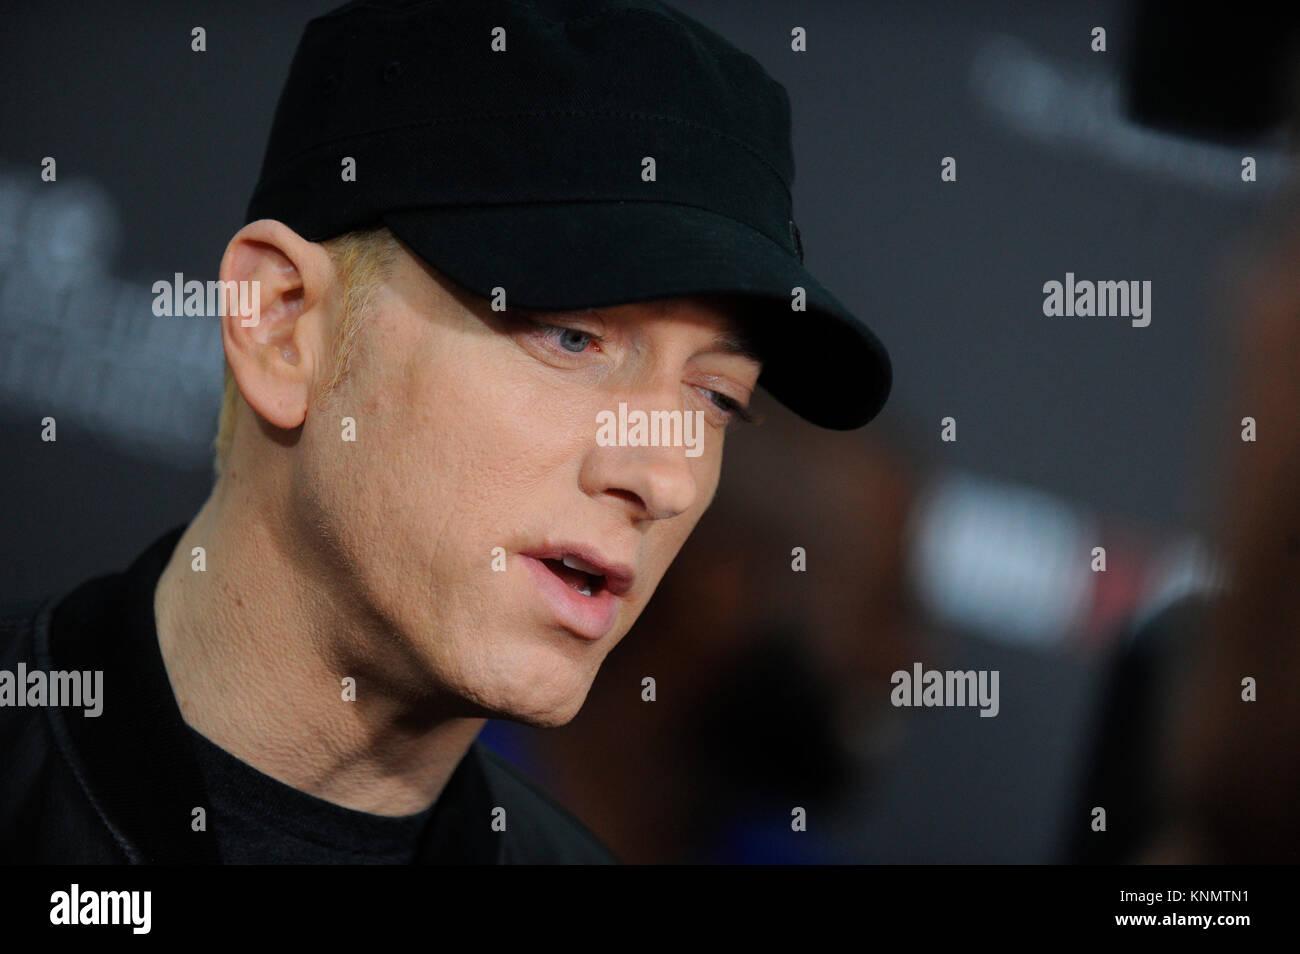 dfaba54d426ae NEW YORK, NY - JULY 20: Eminem attends the 'Southpaw' New York